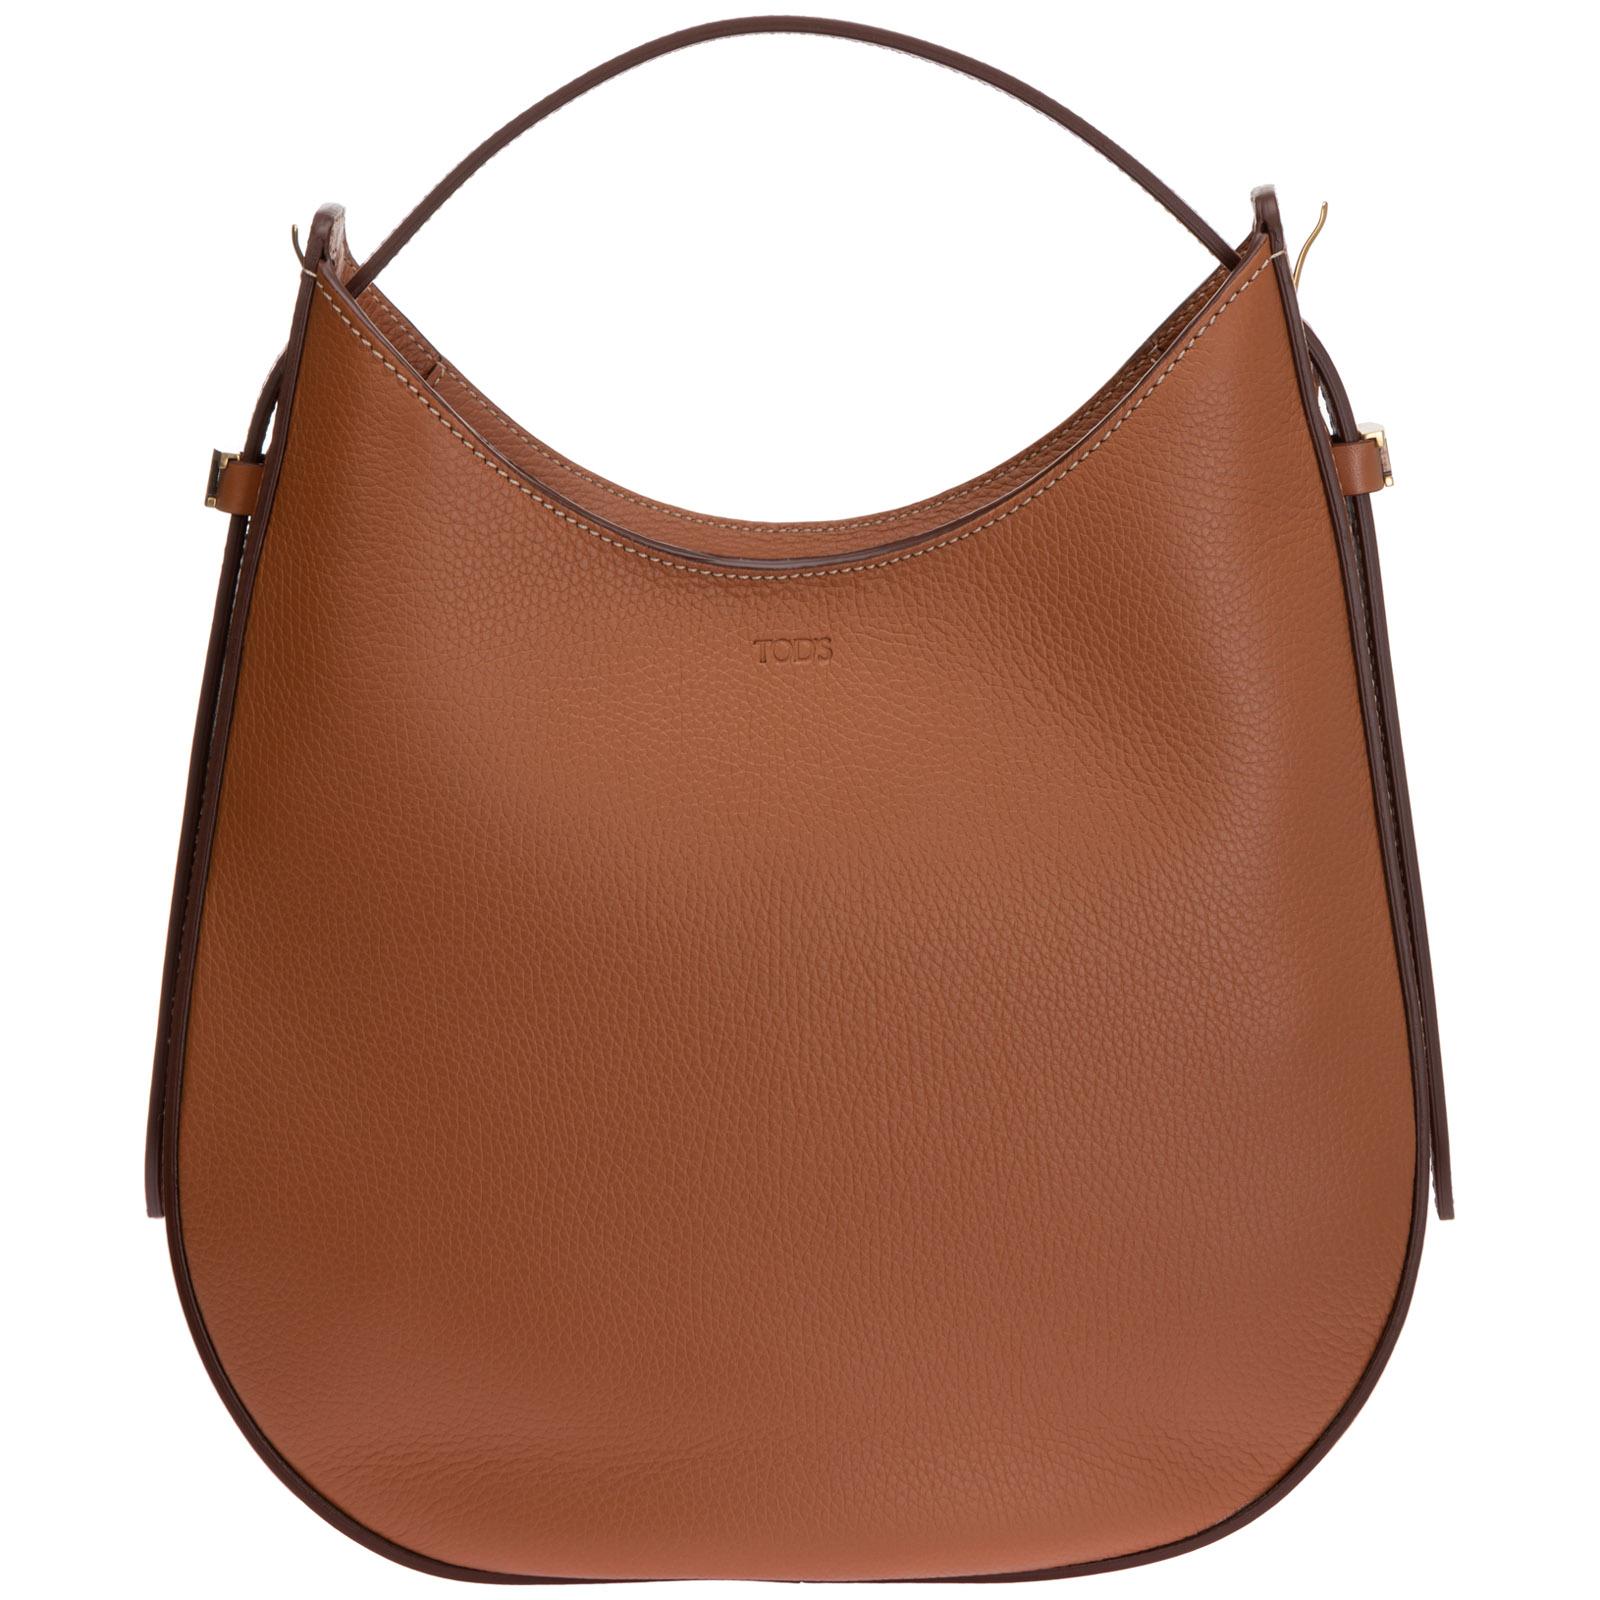 TOD'S WOMEN'S LEATHER SHOULDER BAG